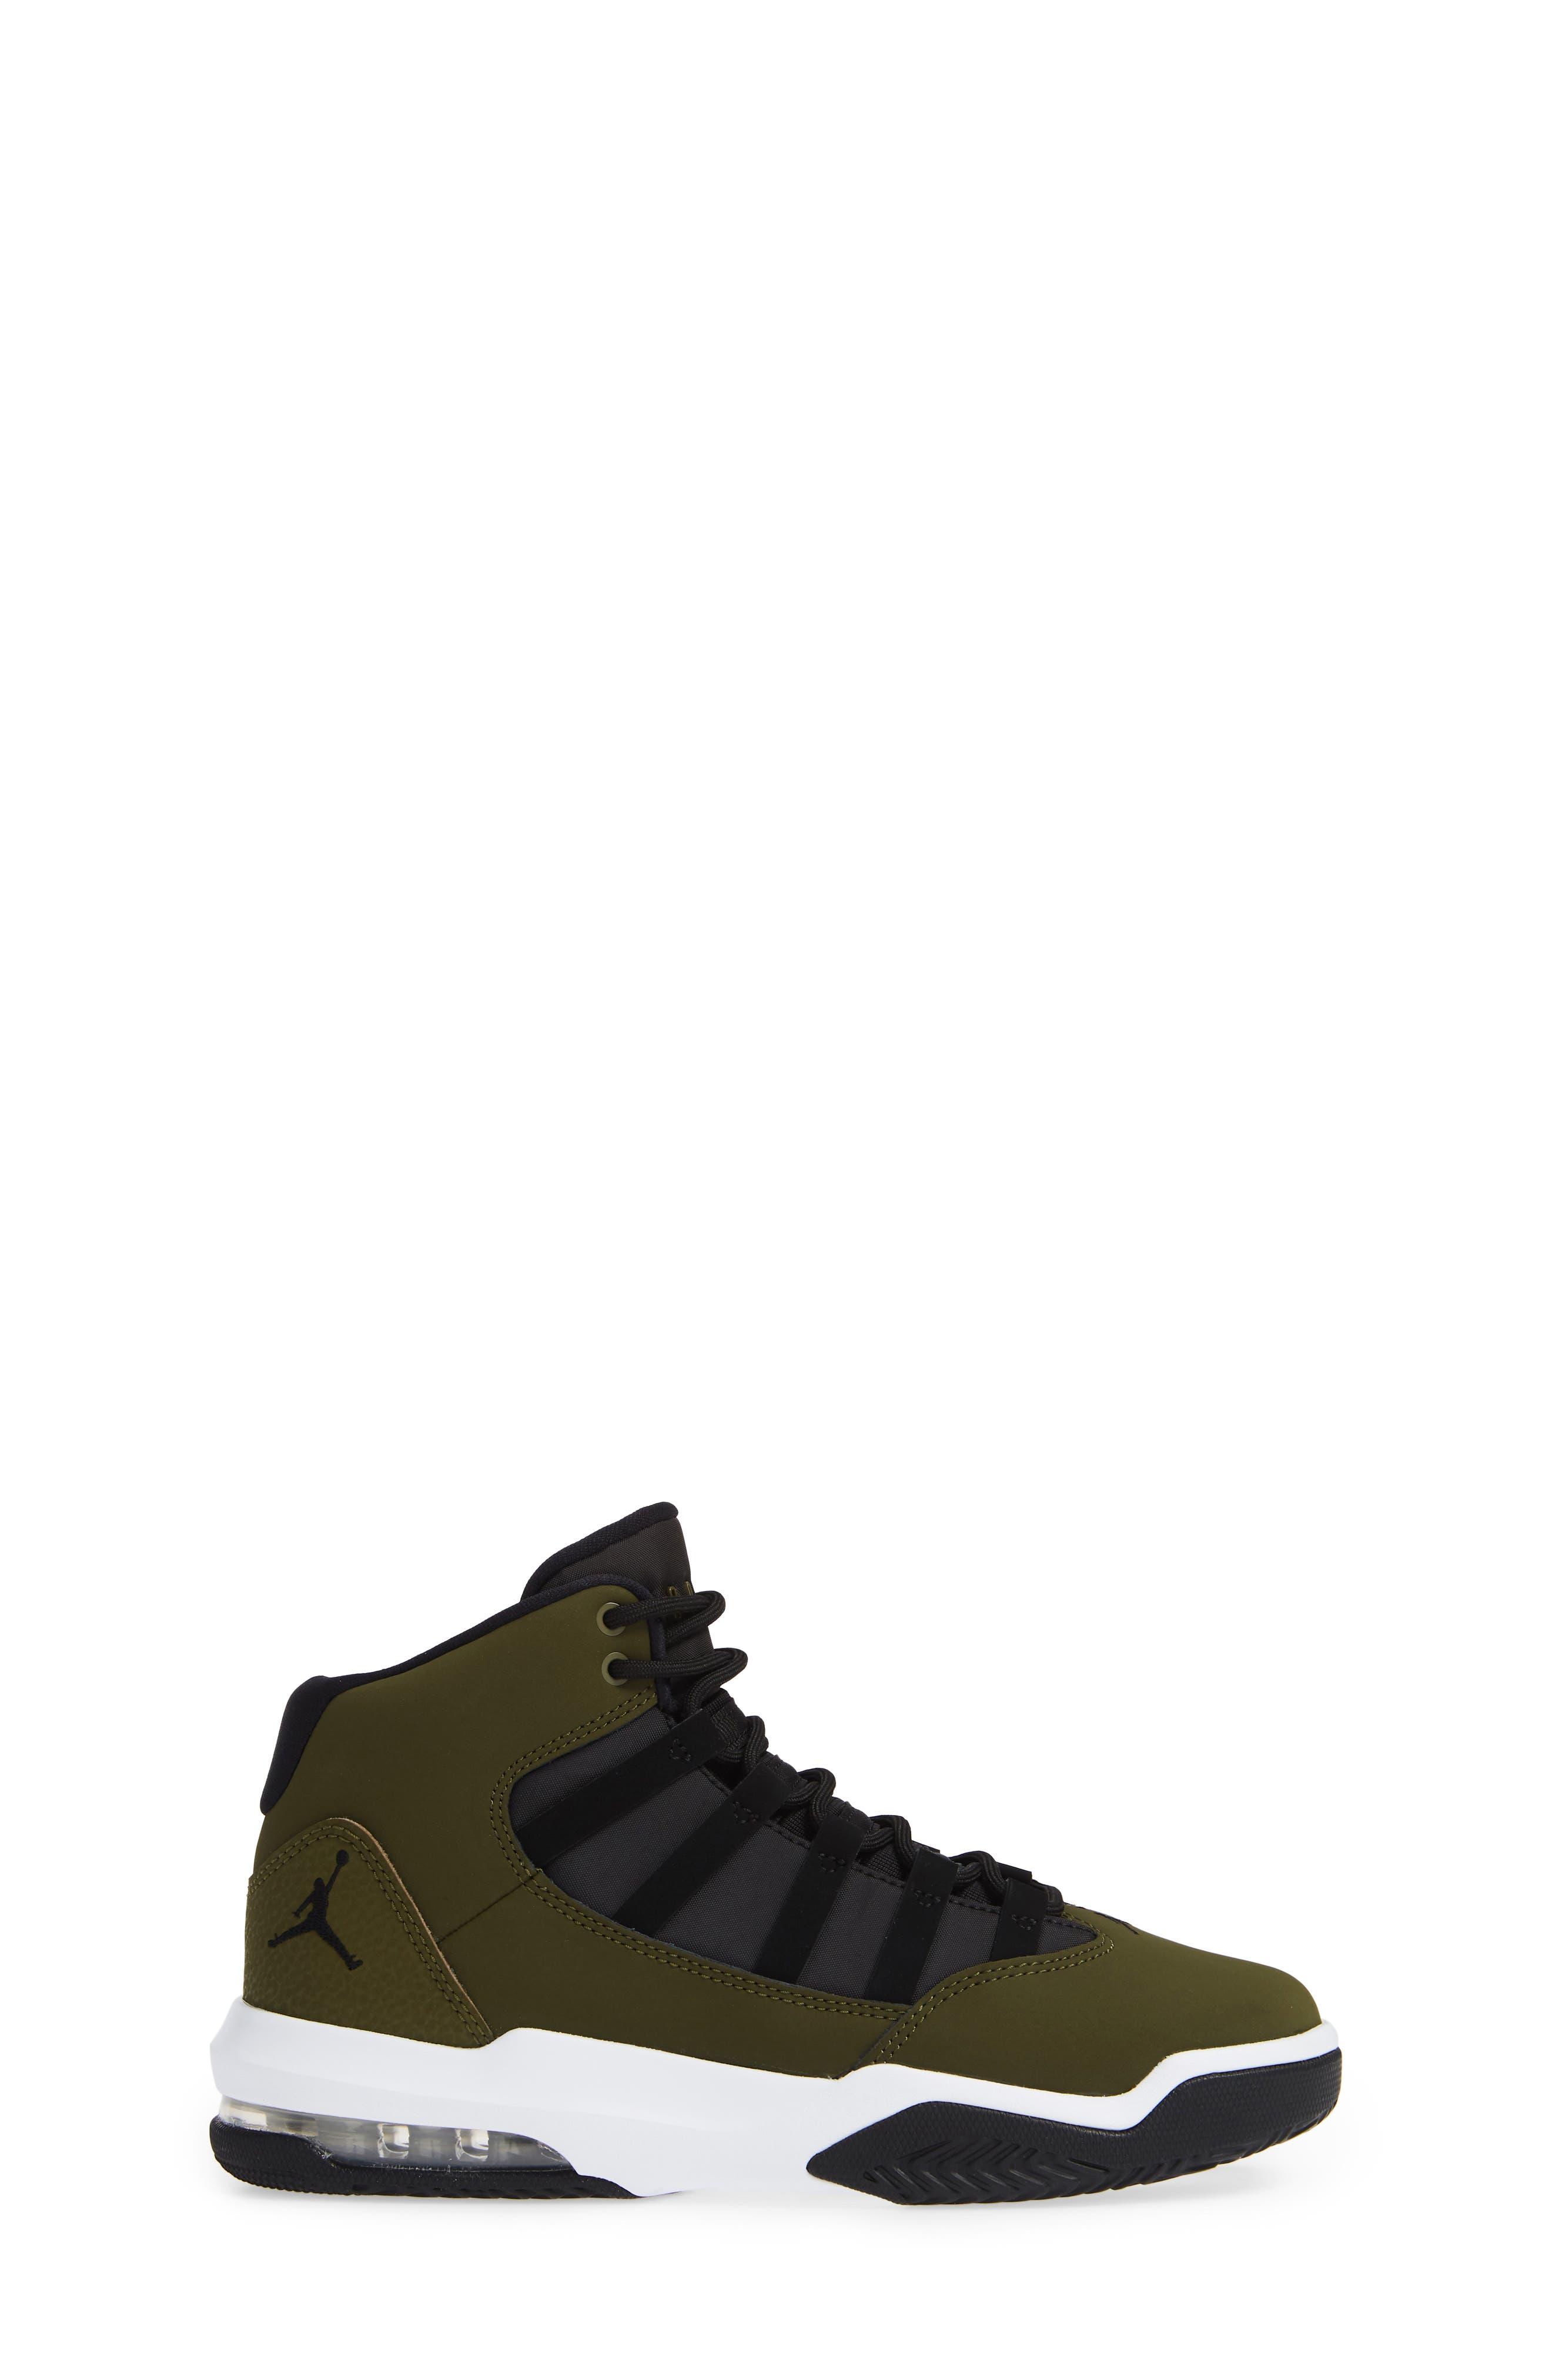 Jordan Max Aura Basketball Shoe,                             Alternate thumbnail 3, color,                             OLIVE CANVAS/ BLACK/ WHITE